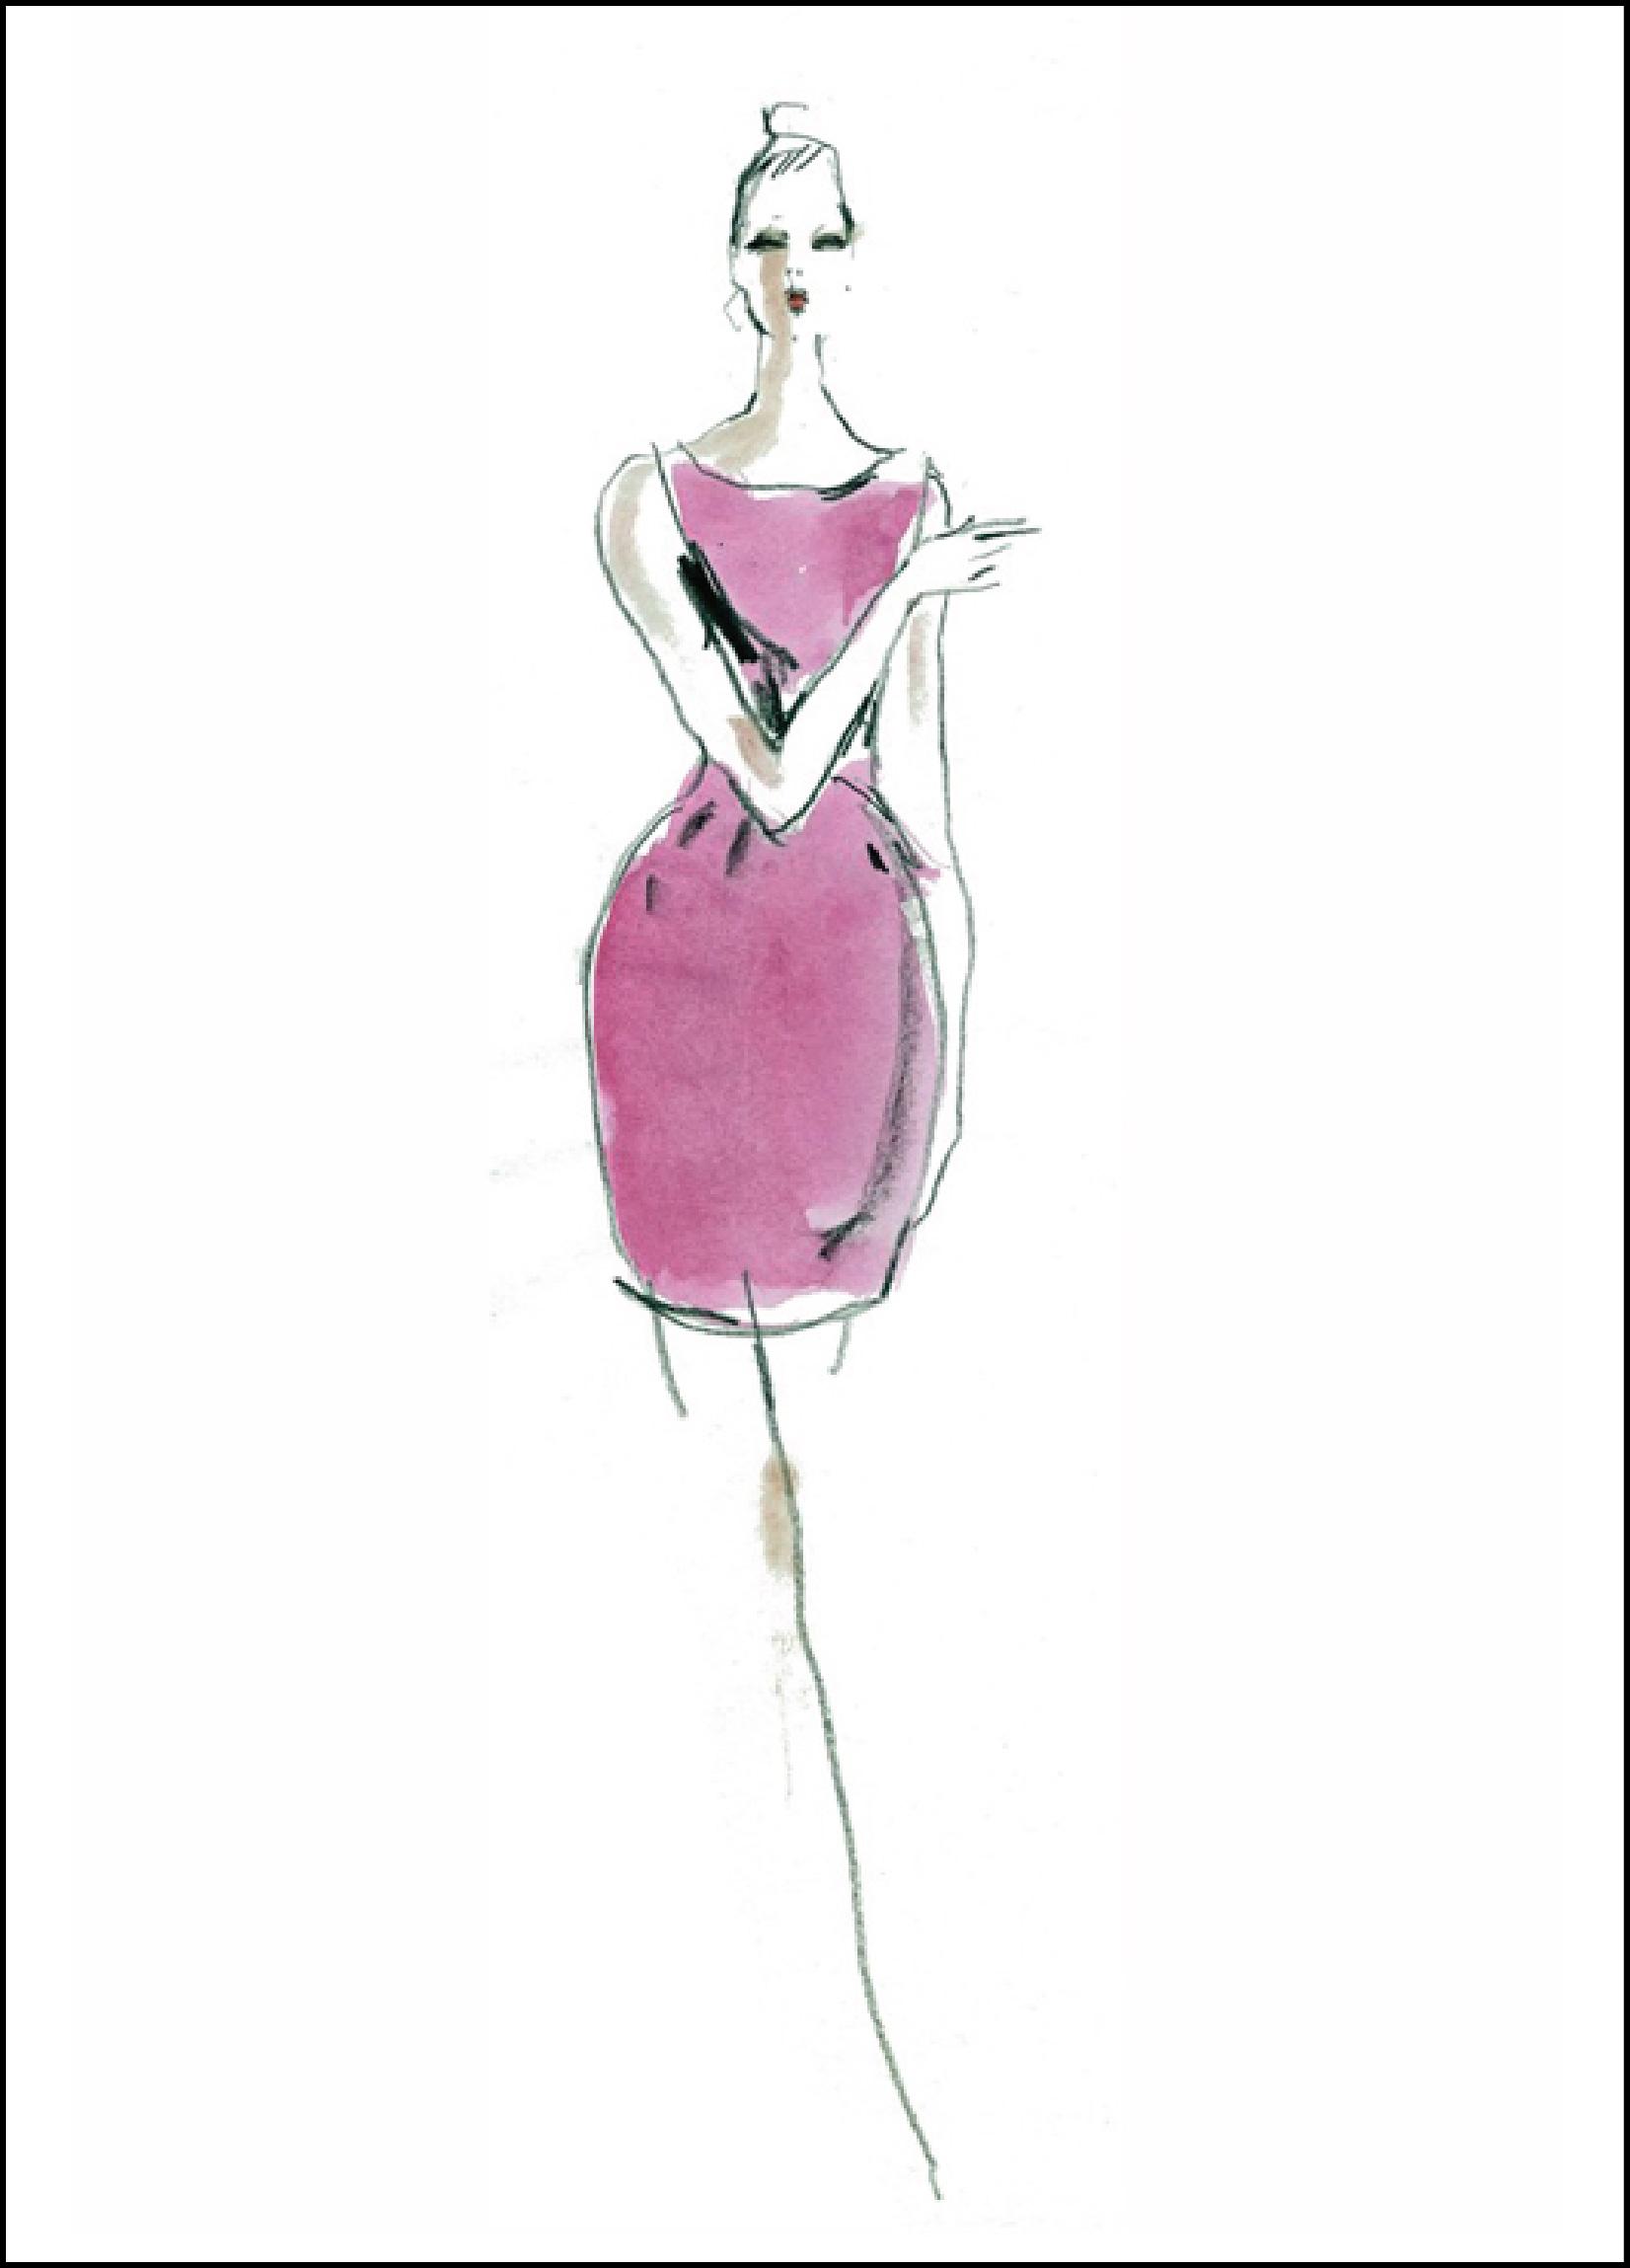 Fashion Illustration Royalty Free Stock Photo: Foundation Diploma Art & Design: Fashion Illustrators